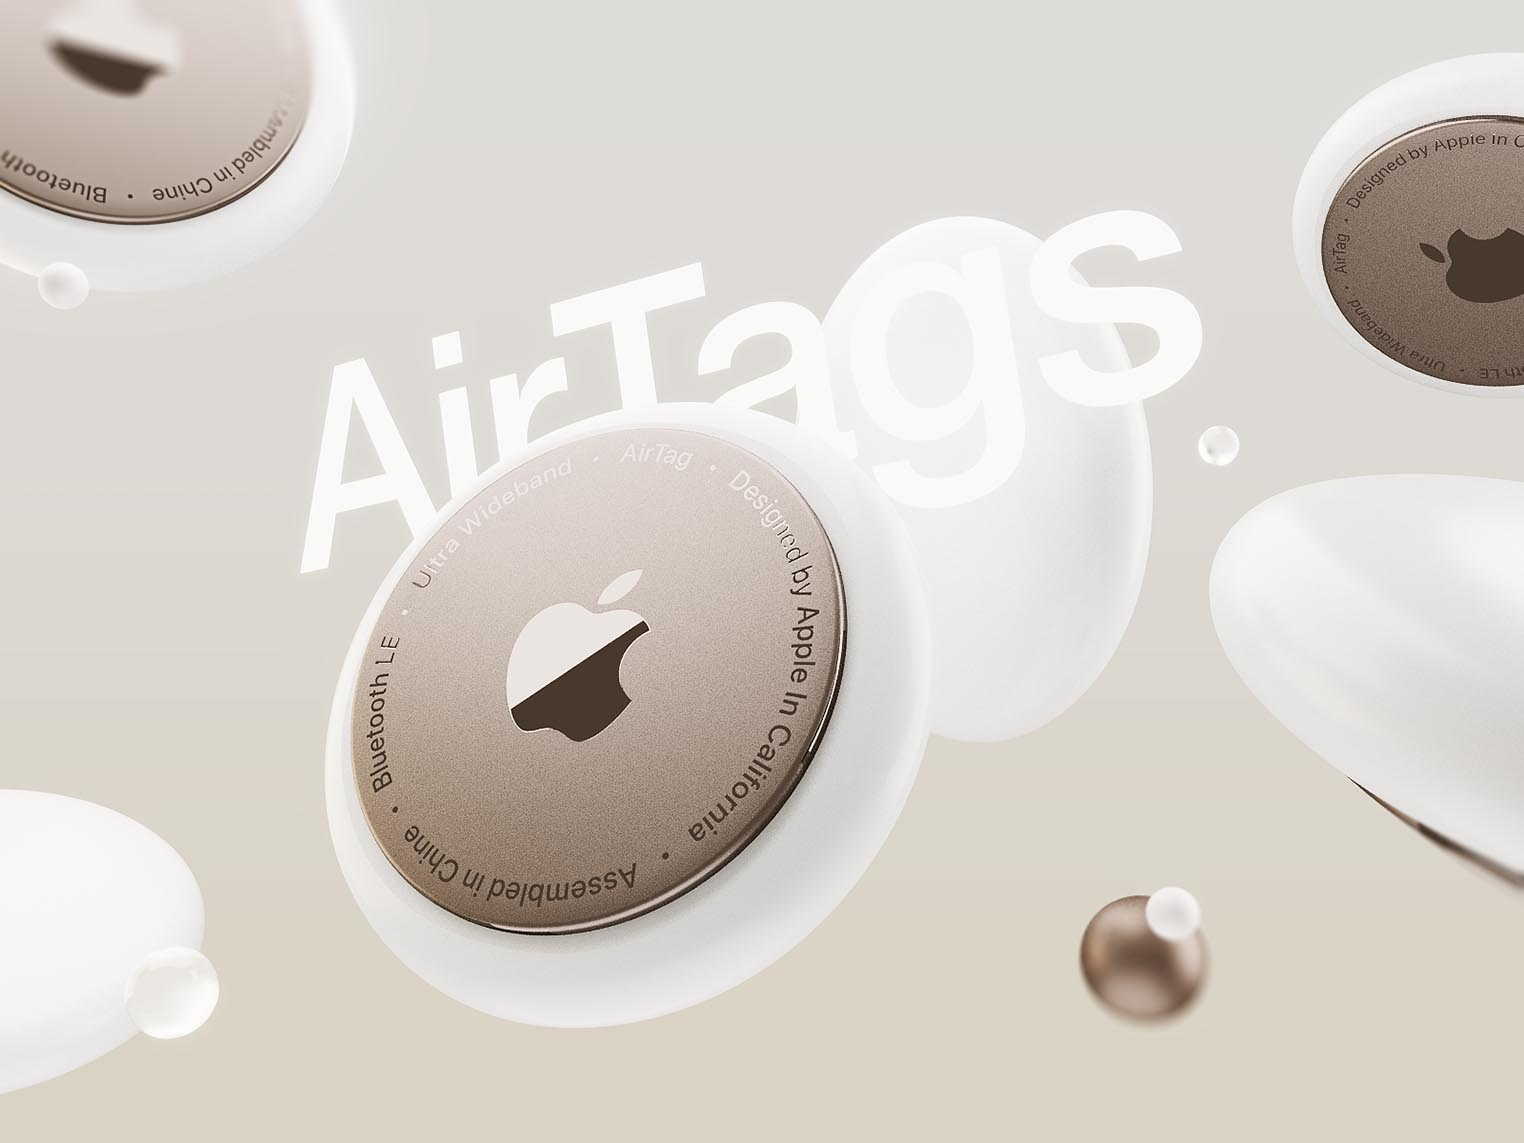 Concept AirTags